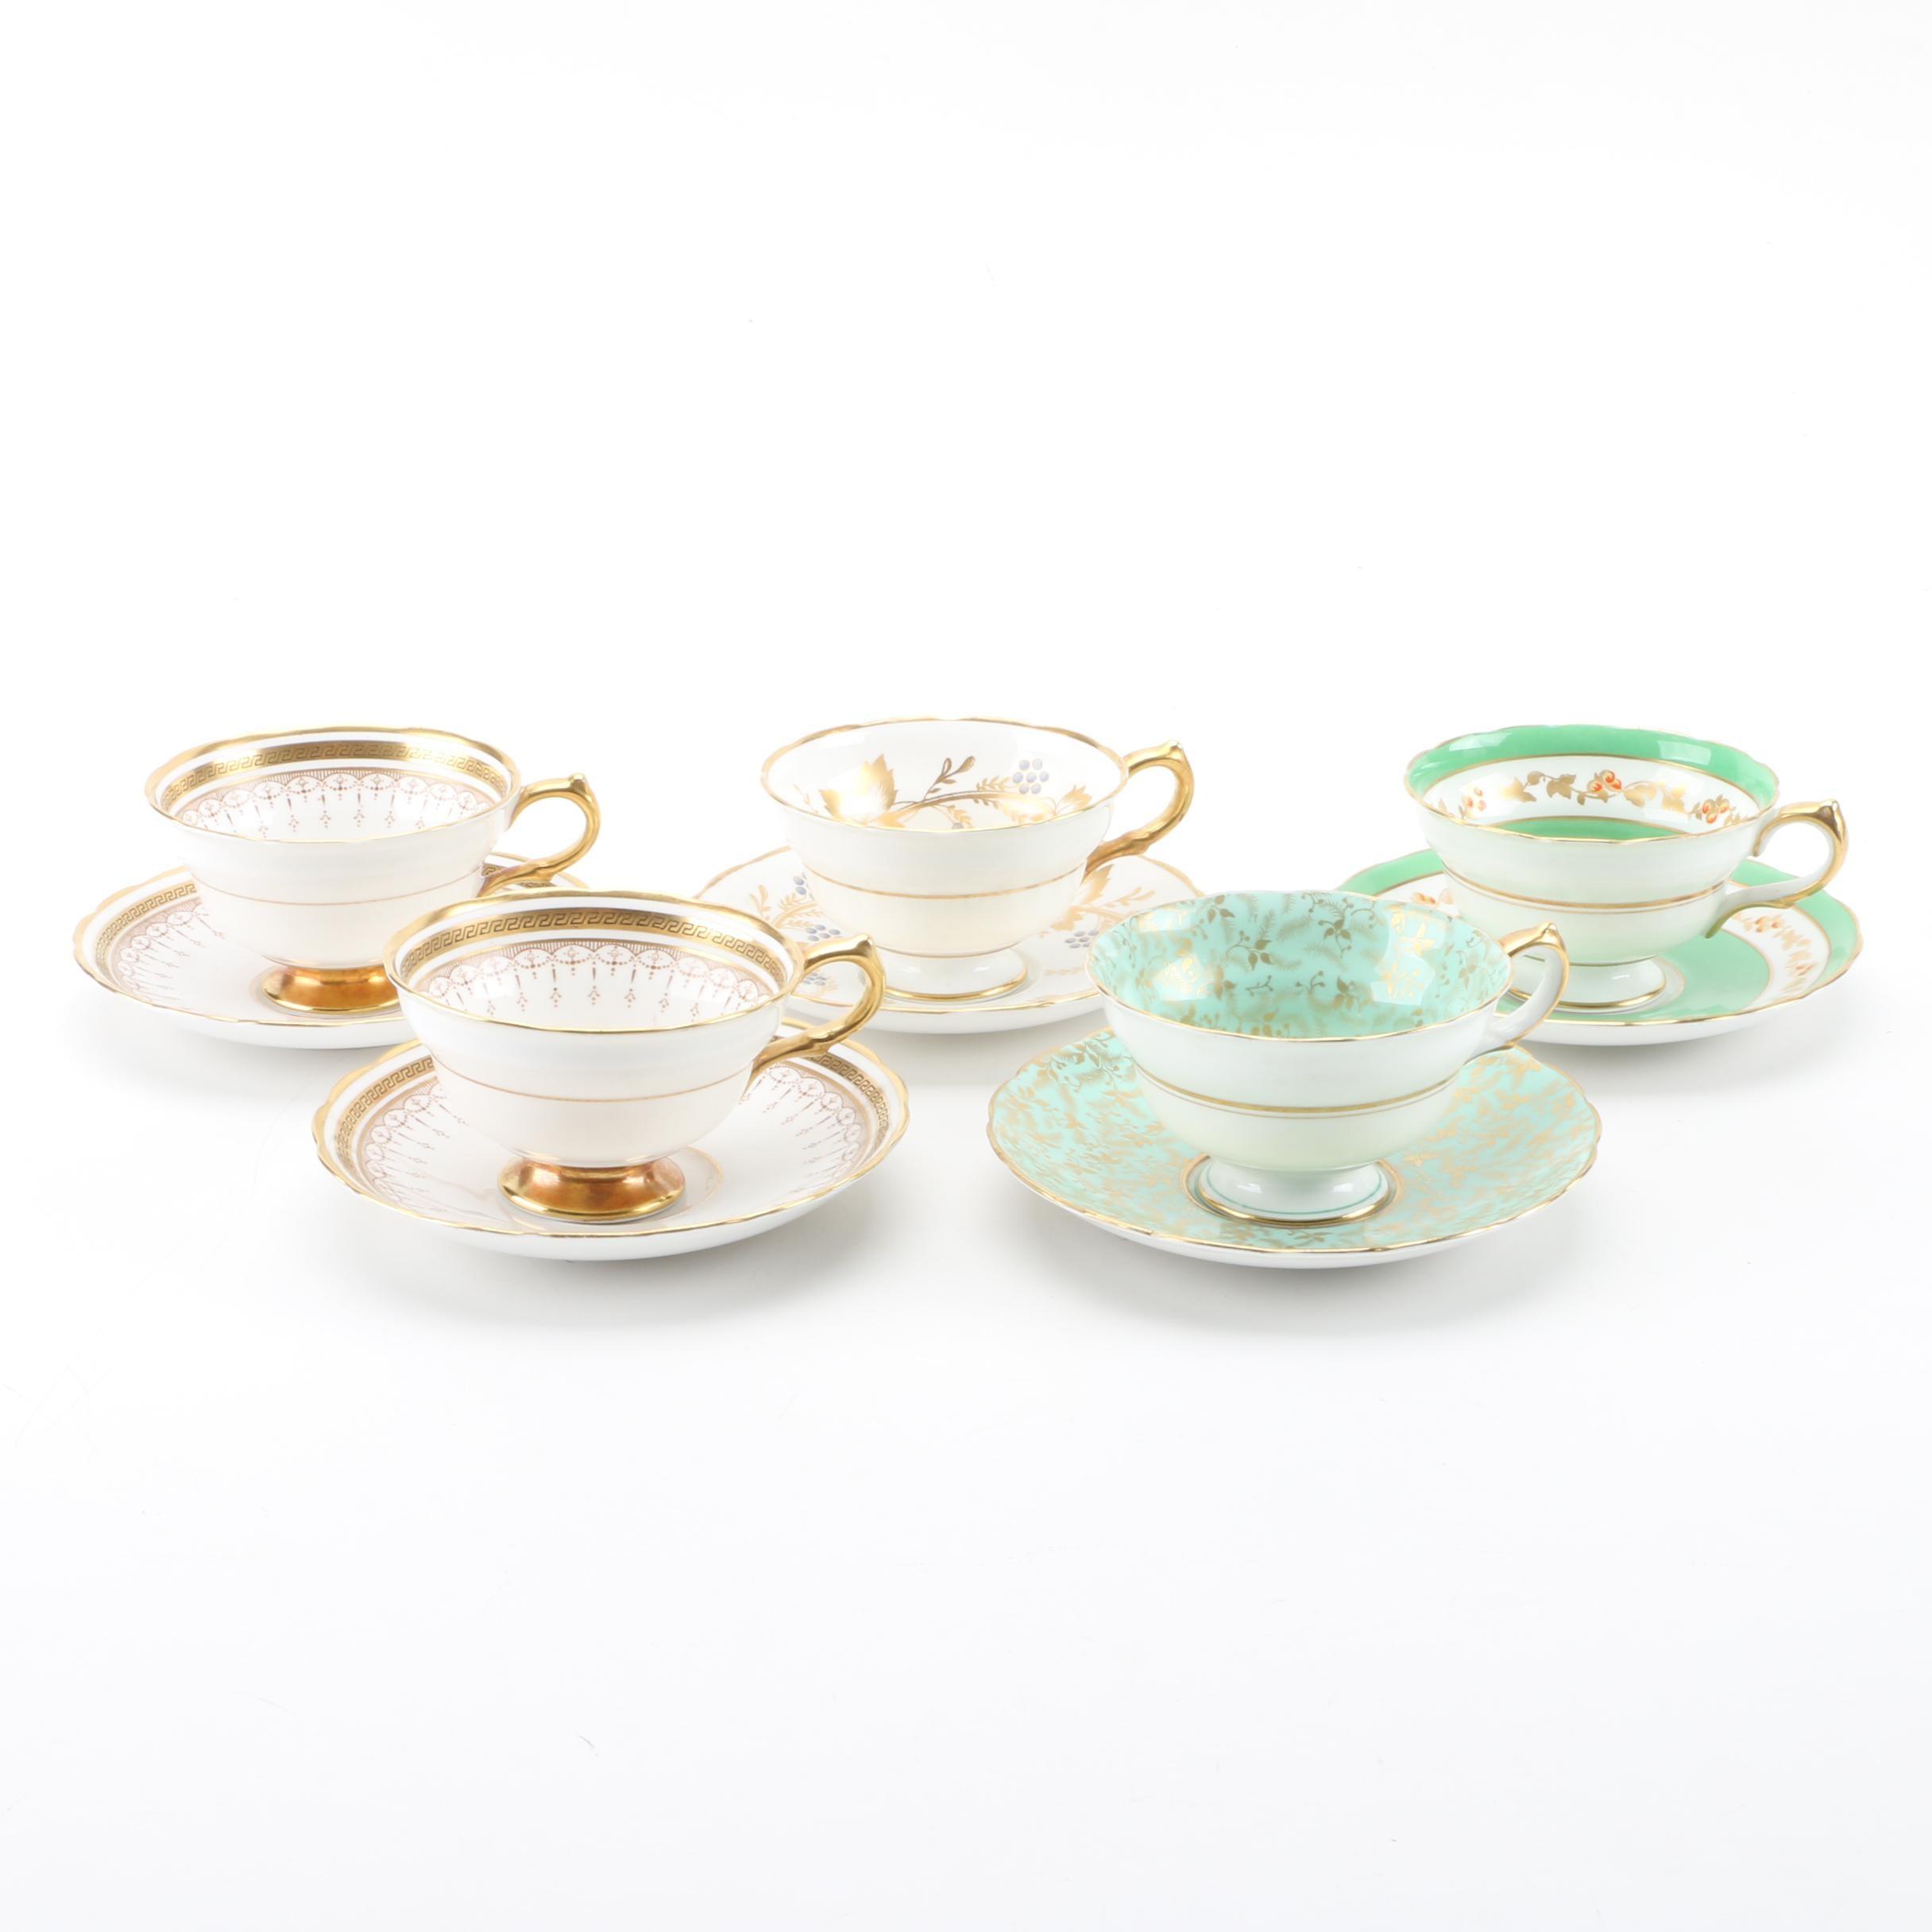 C. 1950s Grosvenor China Porcelain Teacups and Saucers